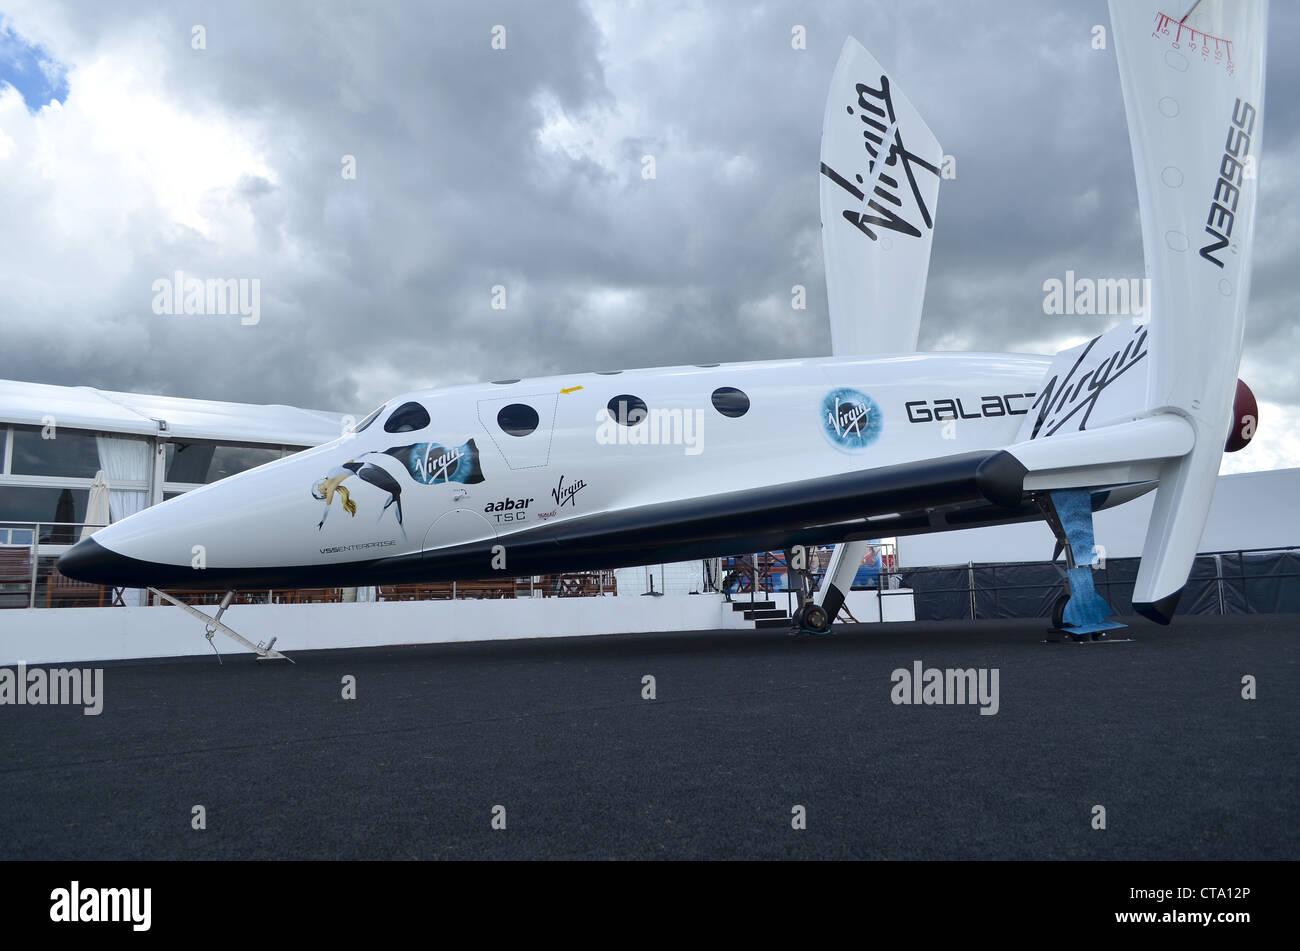 Virgin Galactic Spaceship Two replica on display at Farnborough International Airshow 2012 - Stock Image